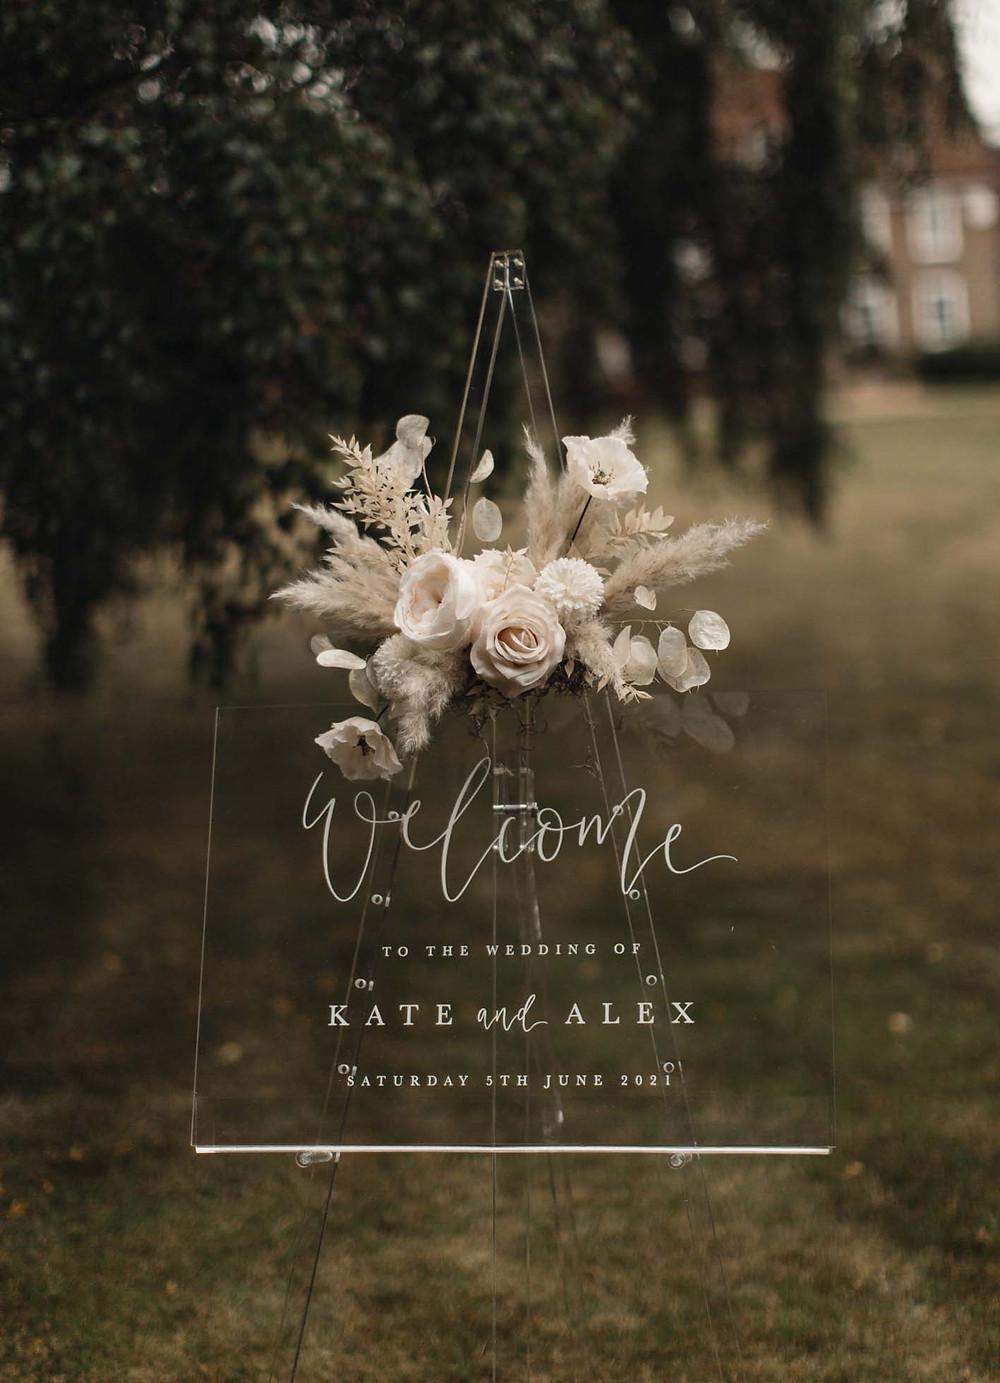 Eco- friendly wedding signage